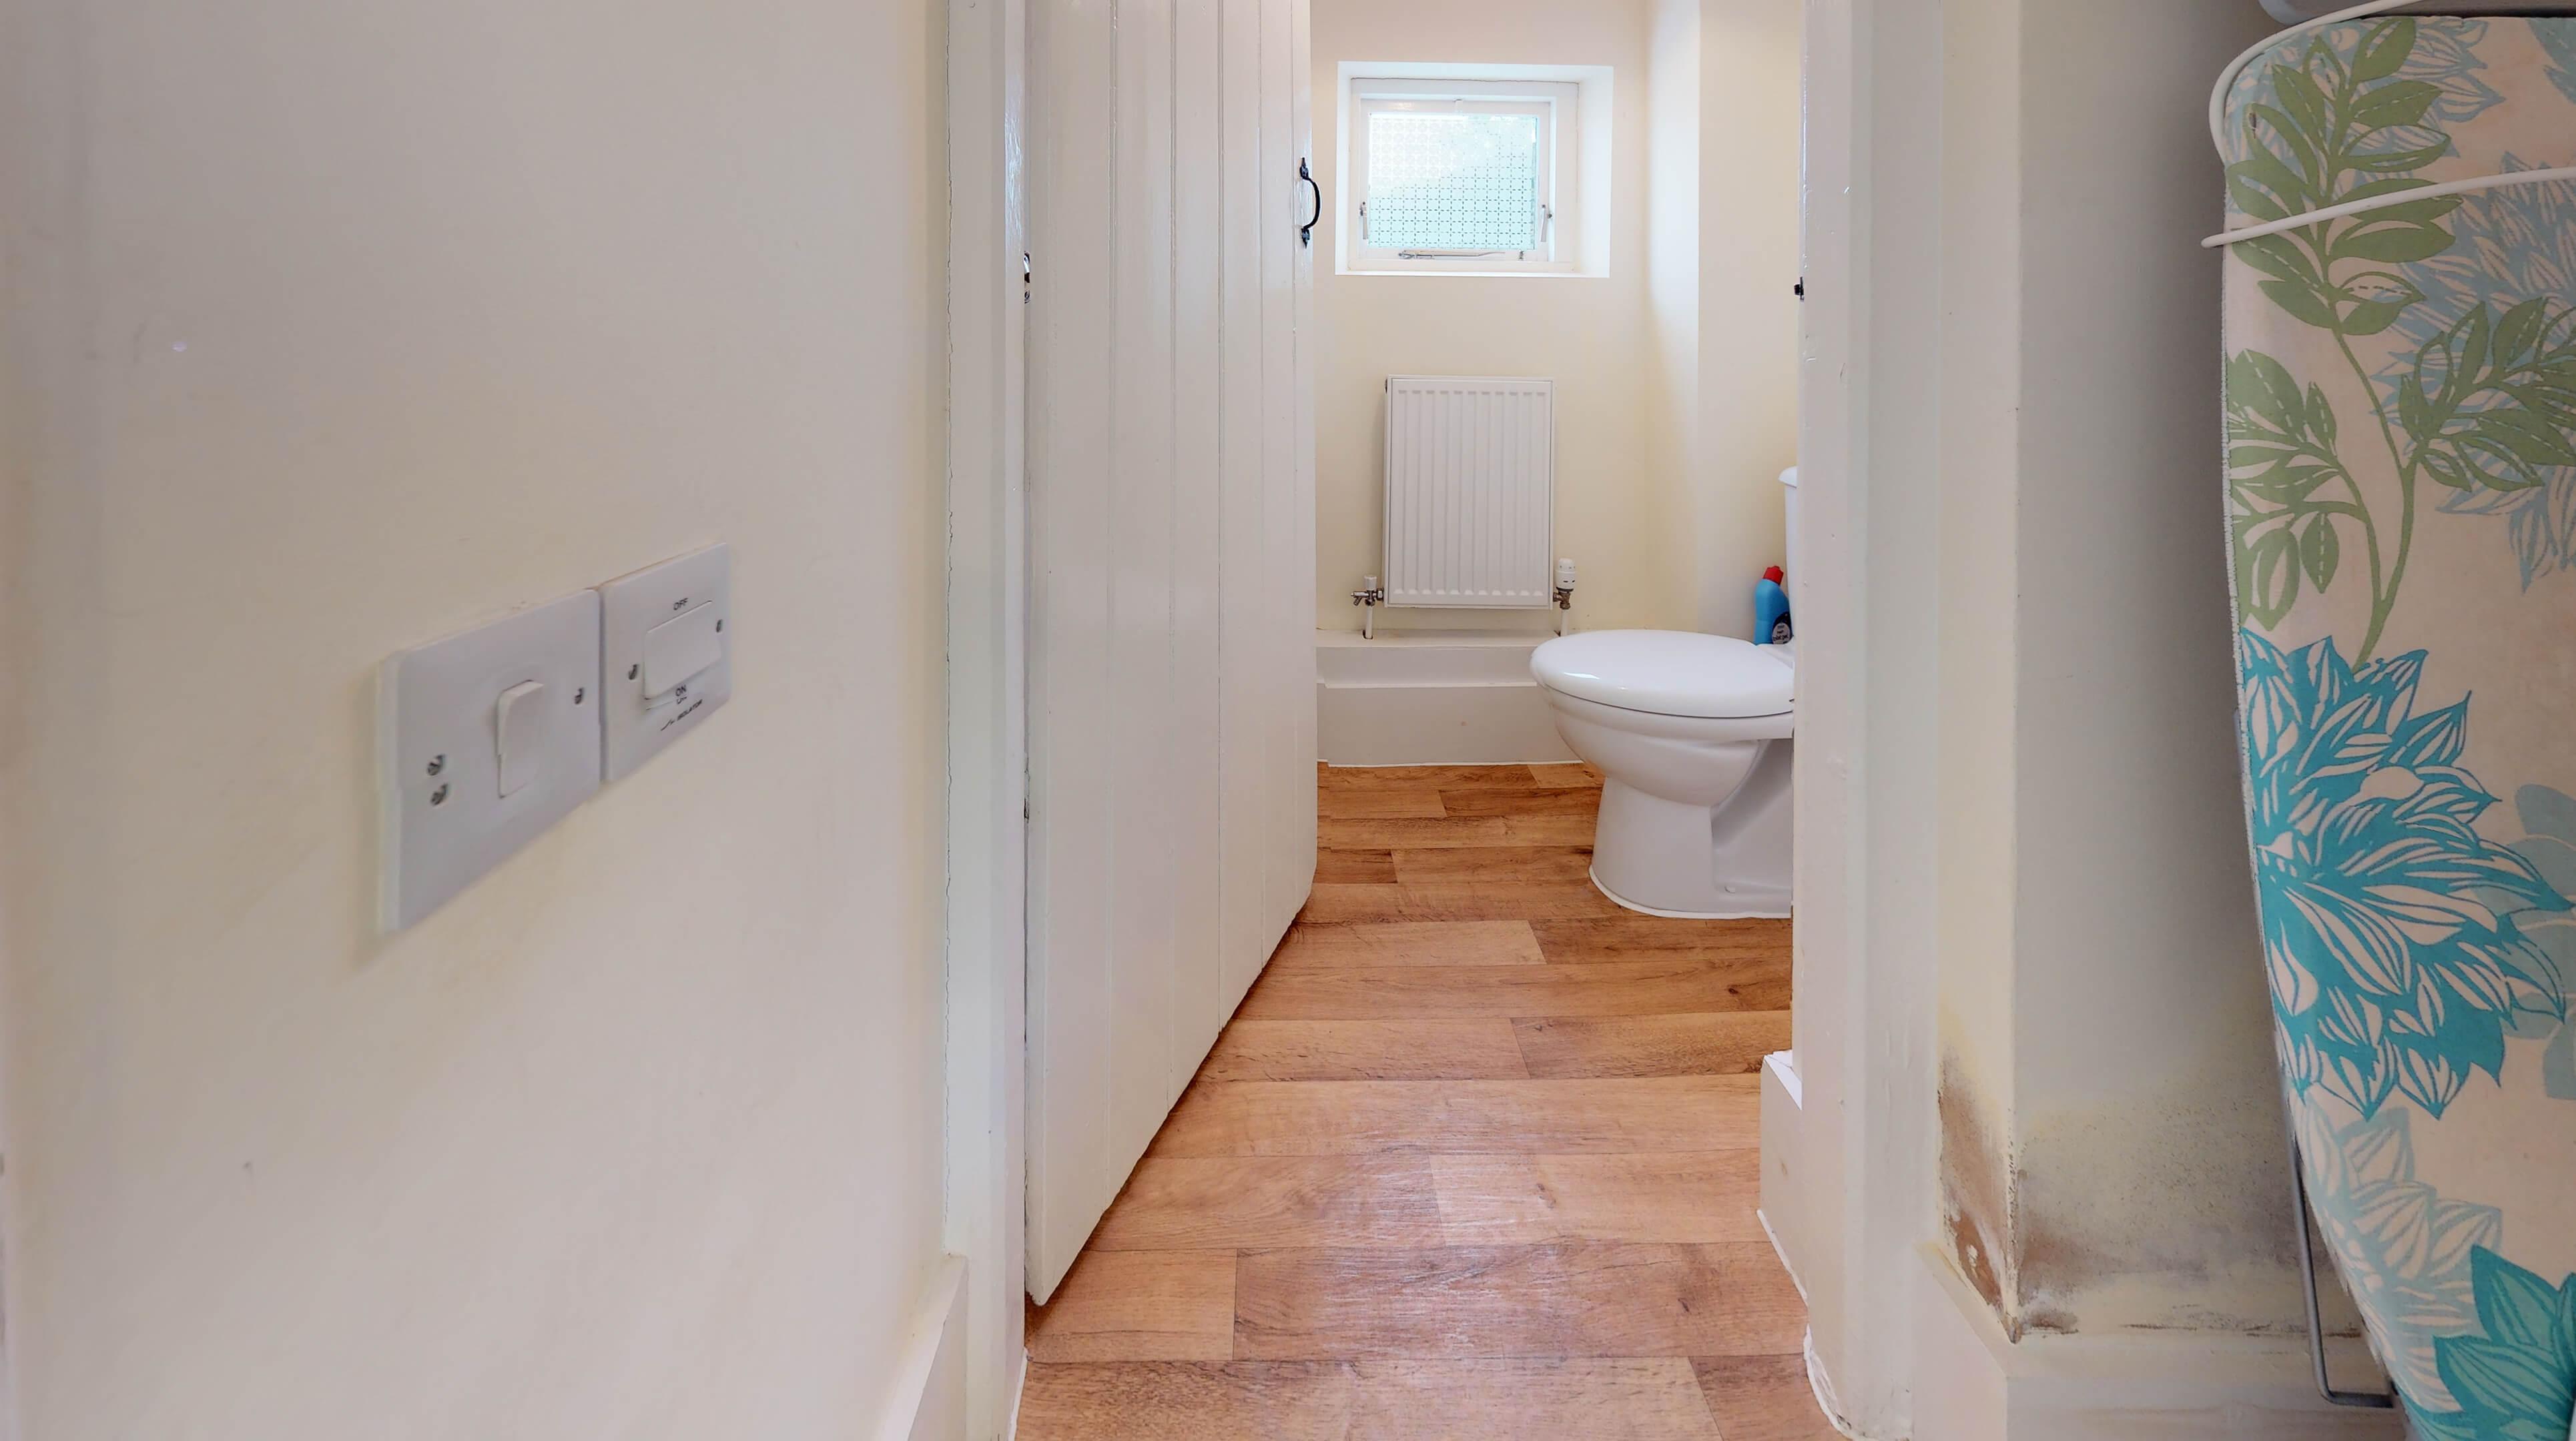 Bladon Two Bedroom Home Farm Cottage Bathroom 3